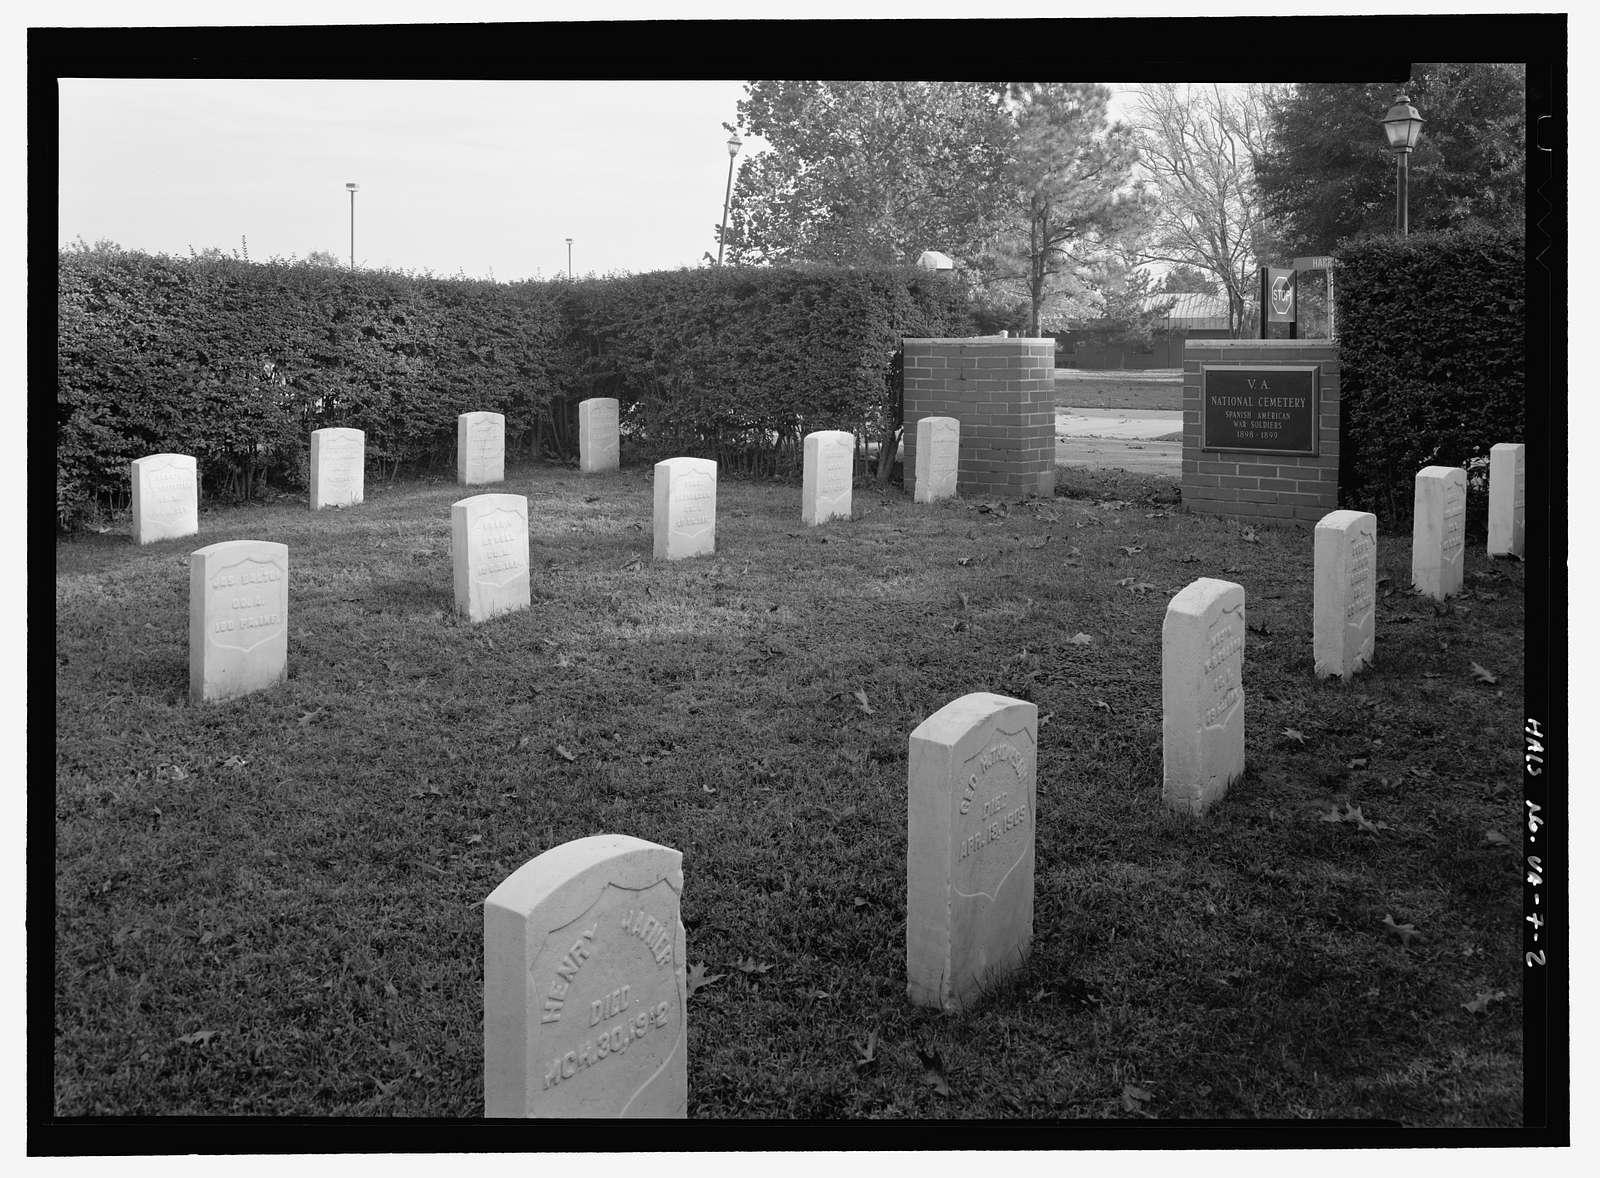 Hampton VAMC (Veteran's Affairs Medical Center), VAMC, Emancipation Drive, Hampton, Hampton, VA